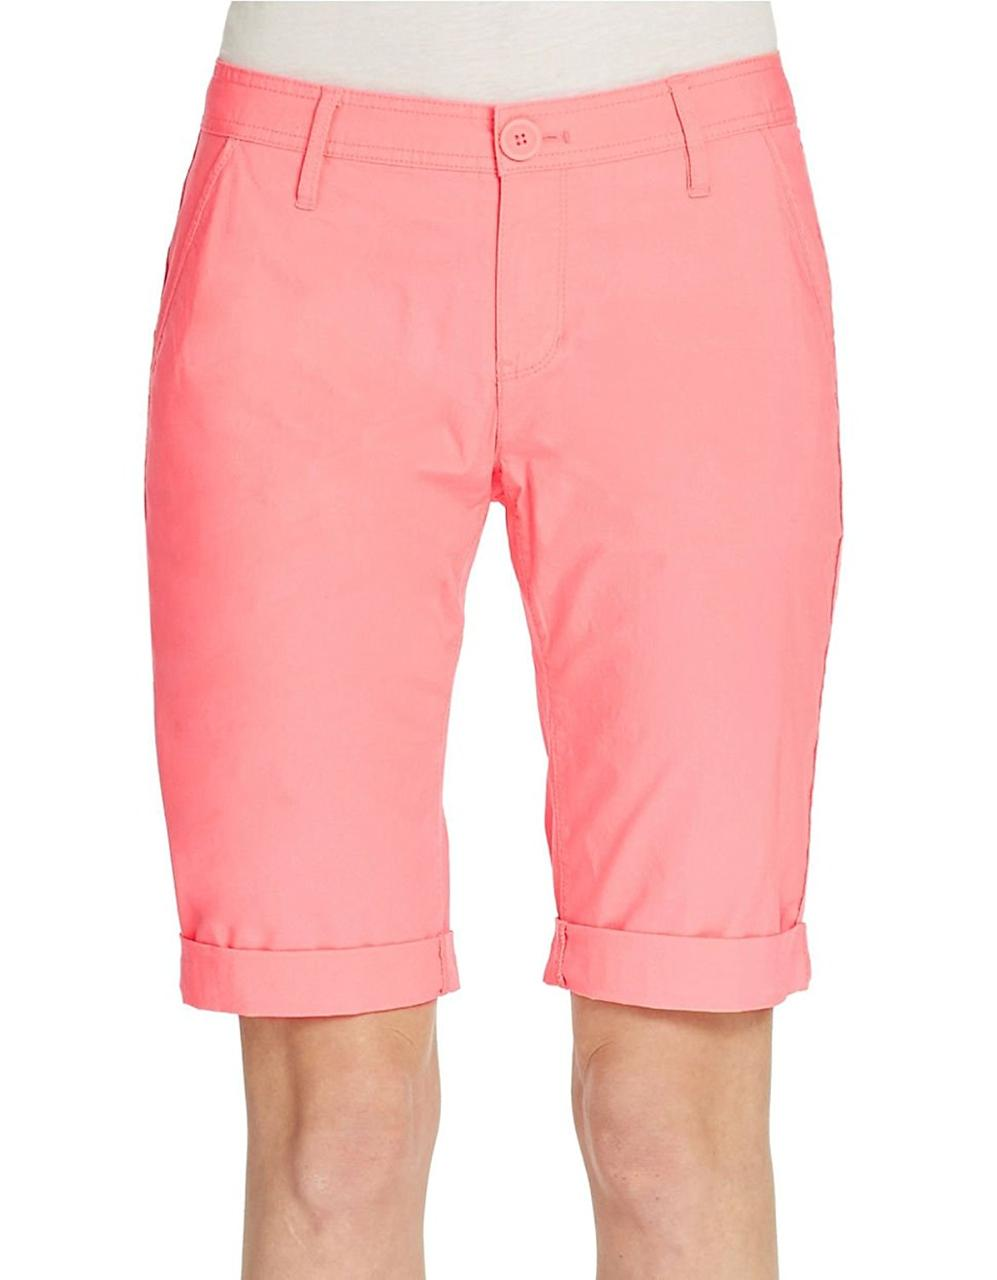 Шорты DKNY Jeans, Coral